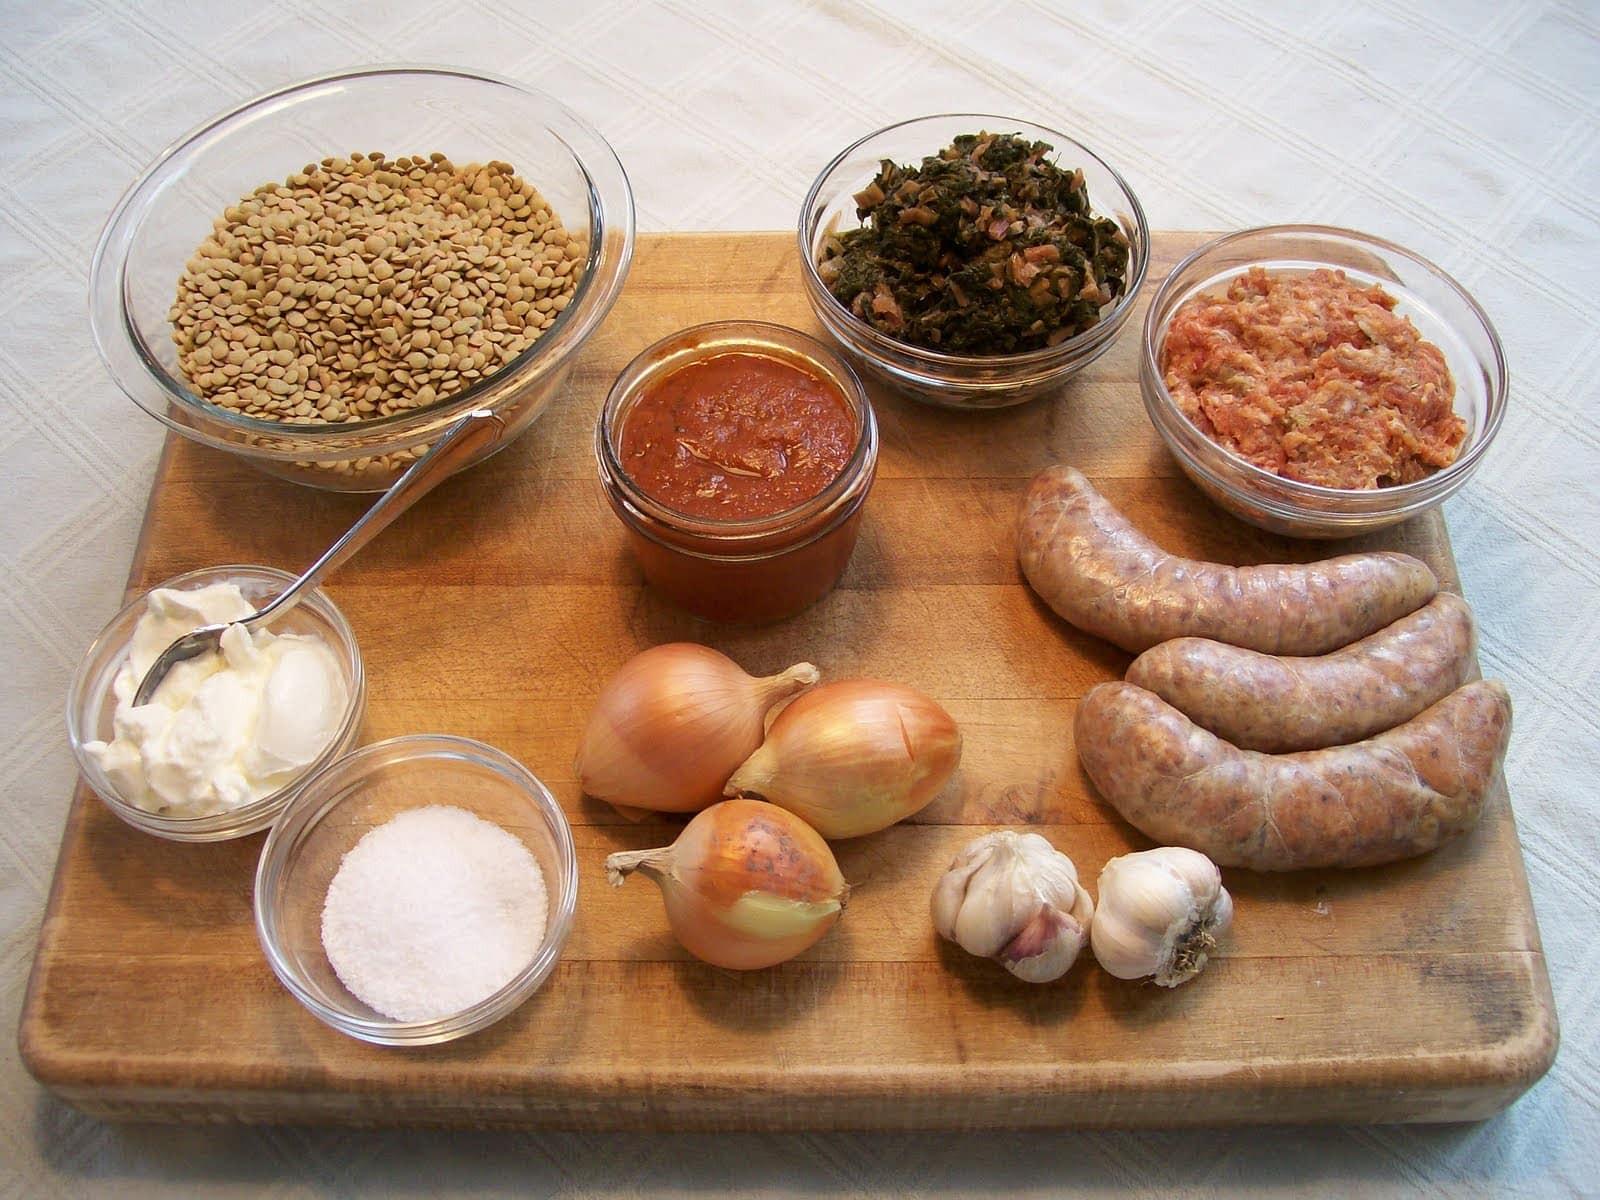 Homemade Italian Sausage Recipes  This Homemade Italian Sausage Recipe Is Unlike Anything